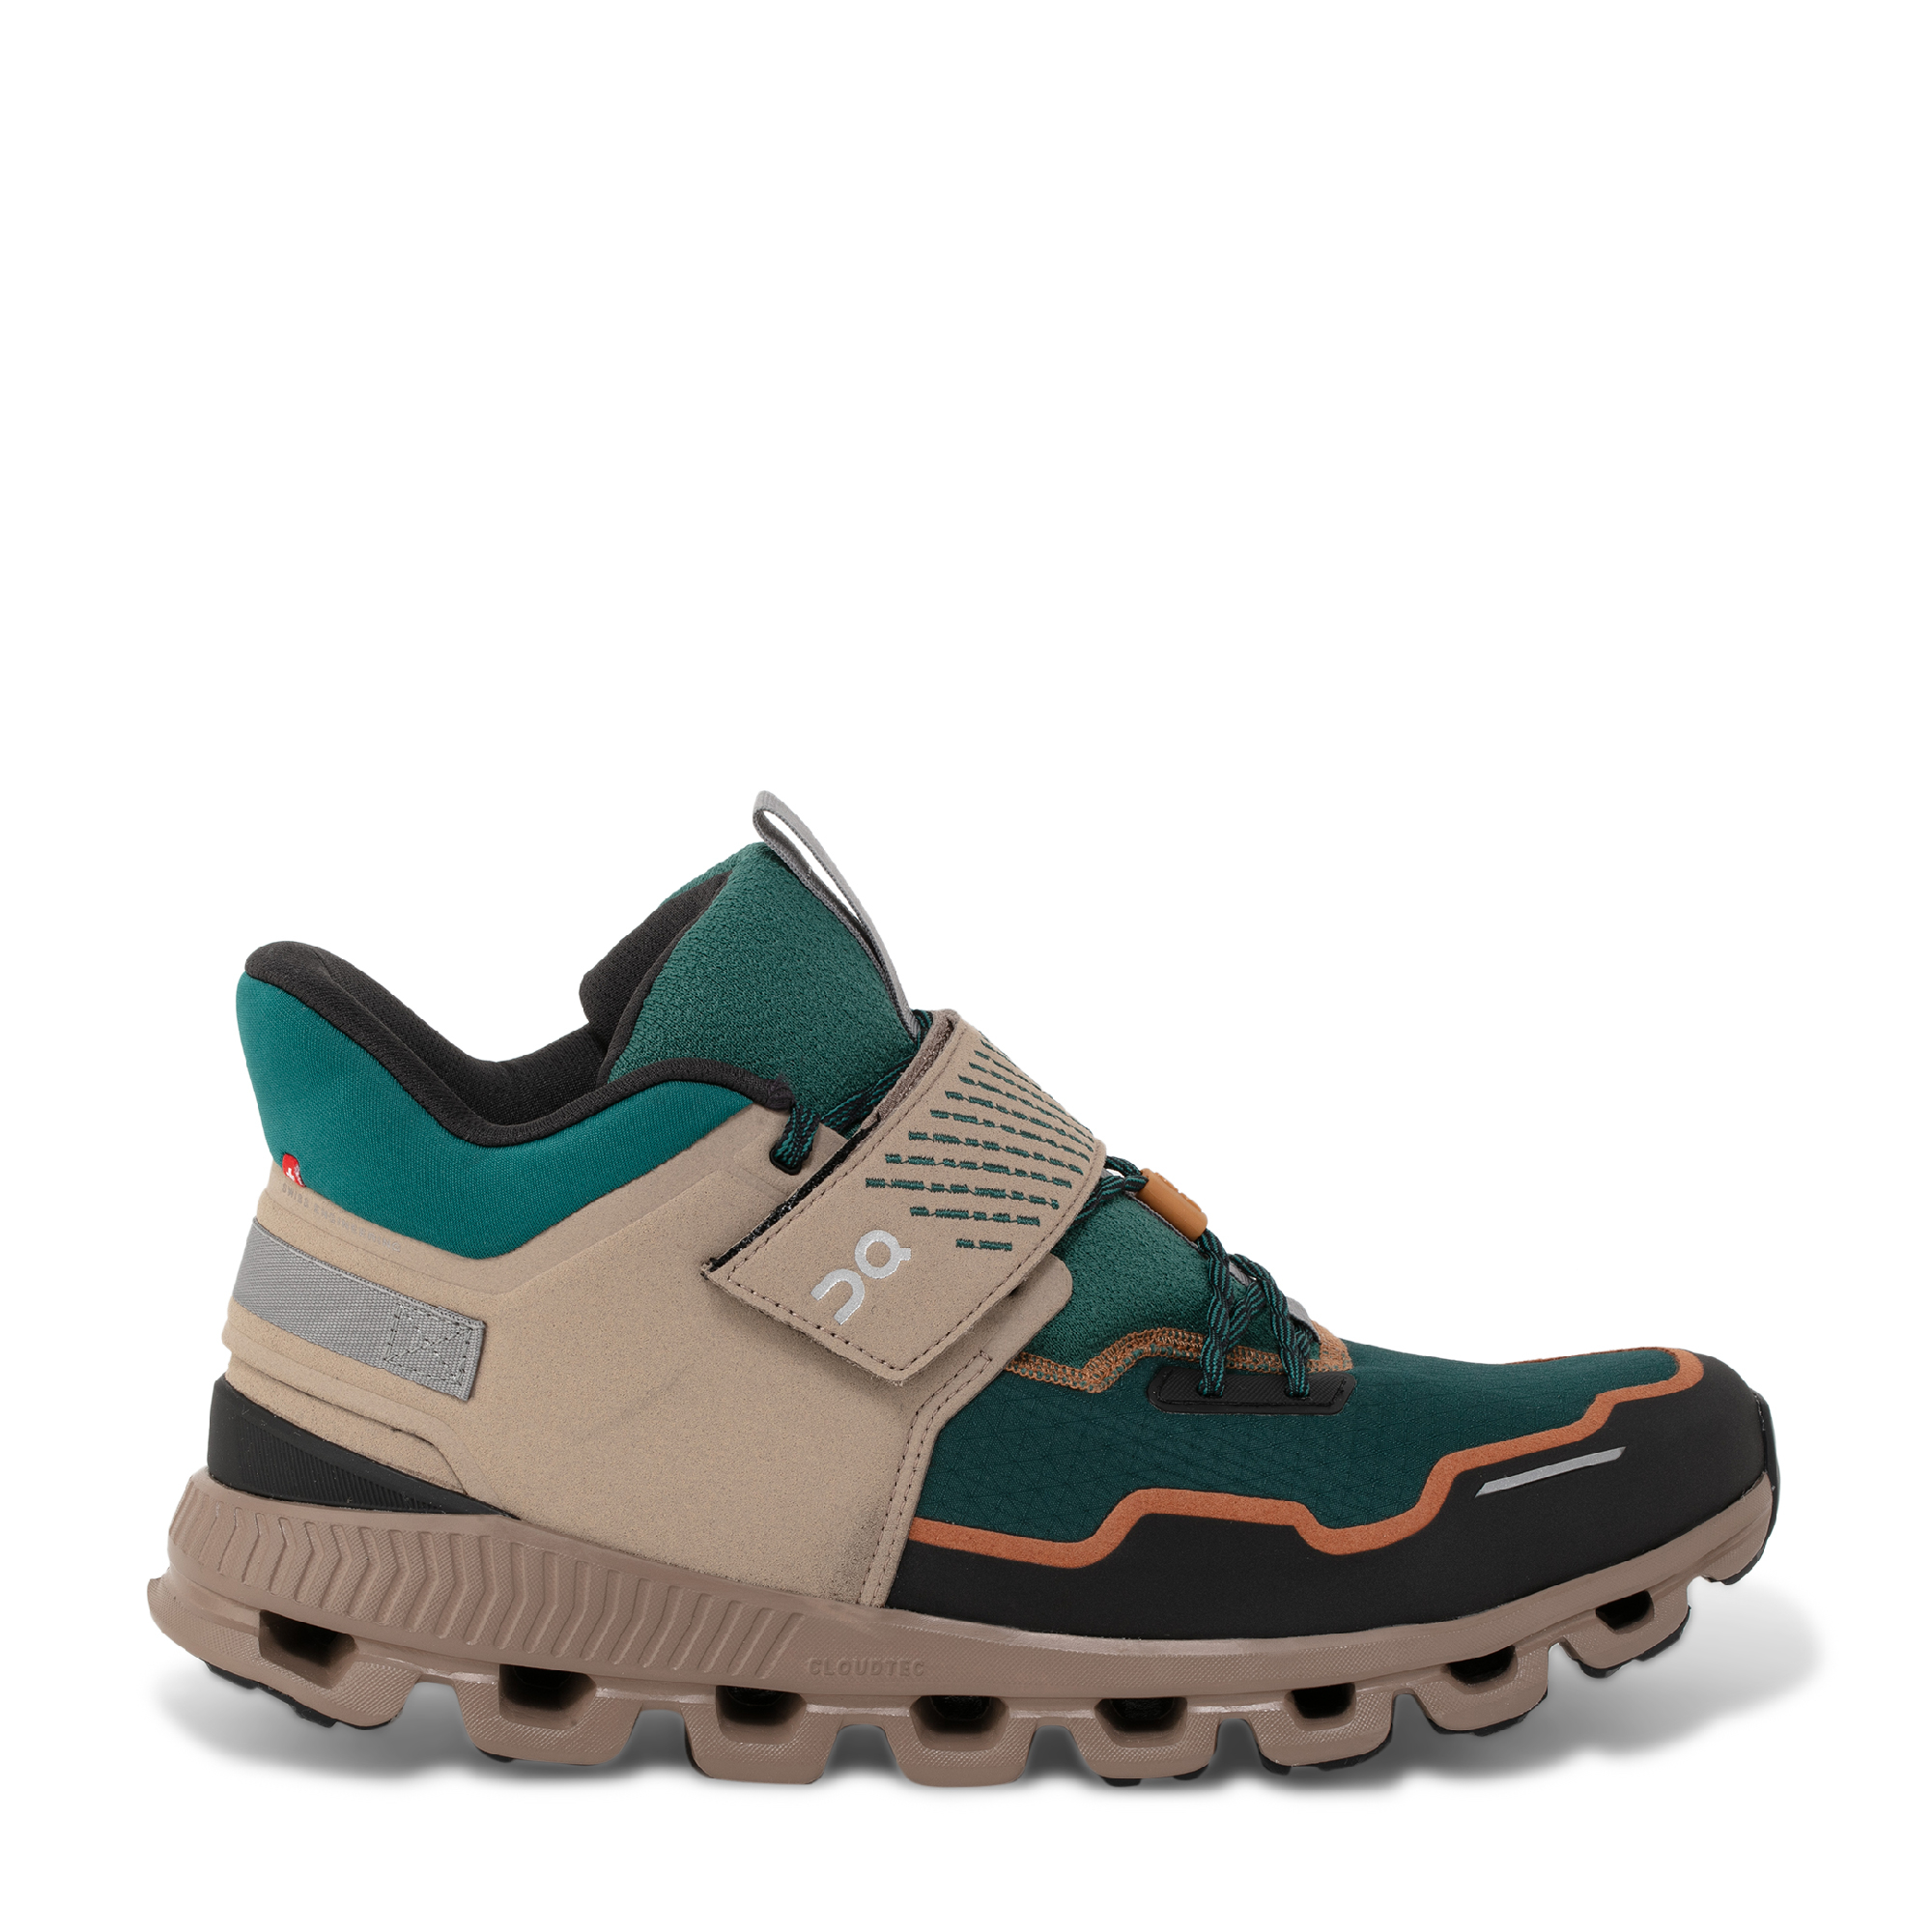 Cloud Hi Edge Defy sneakers